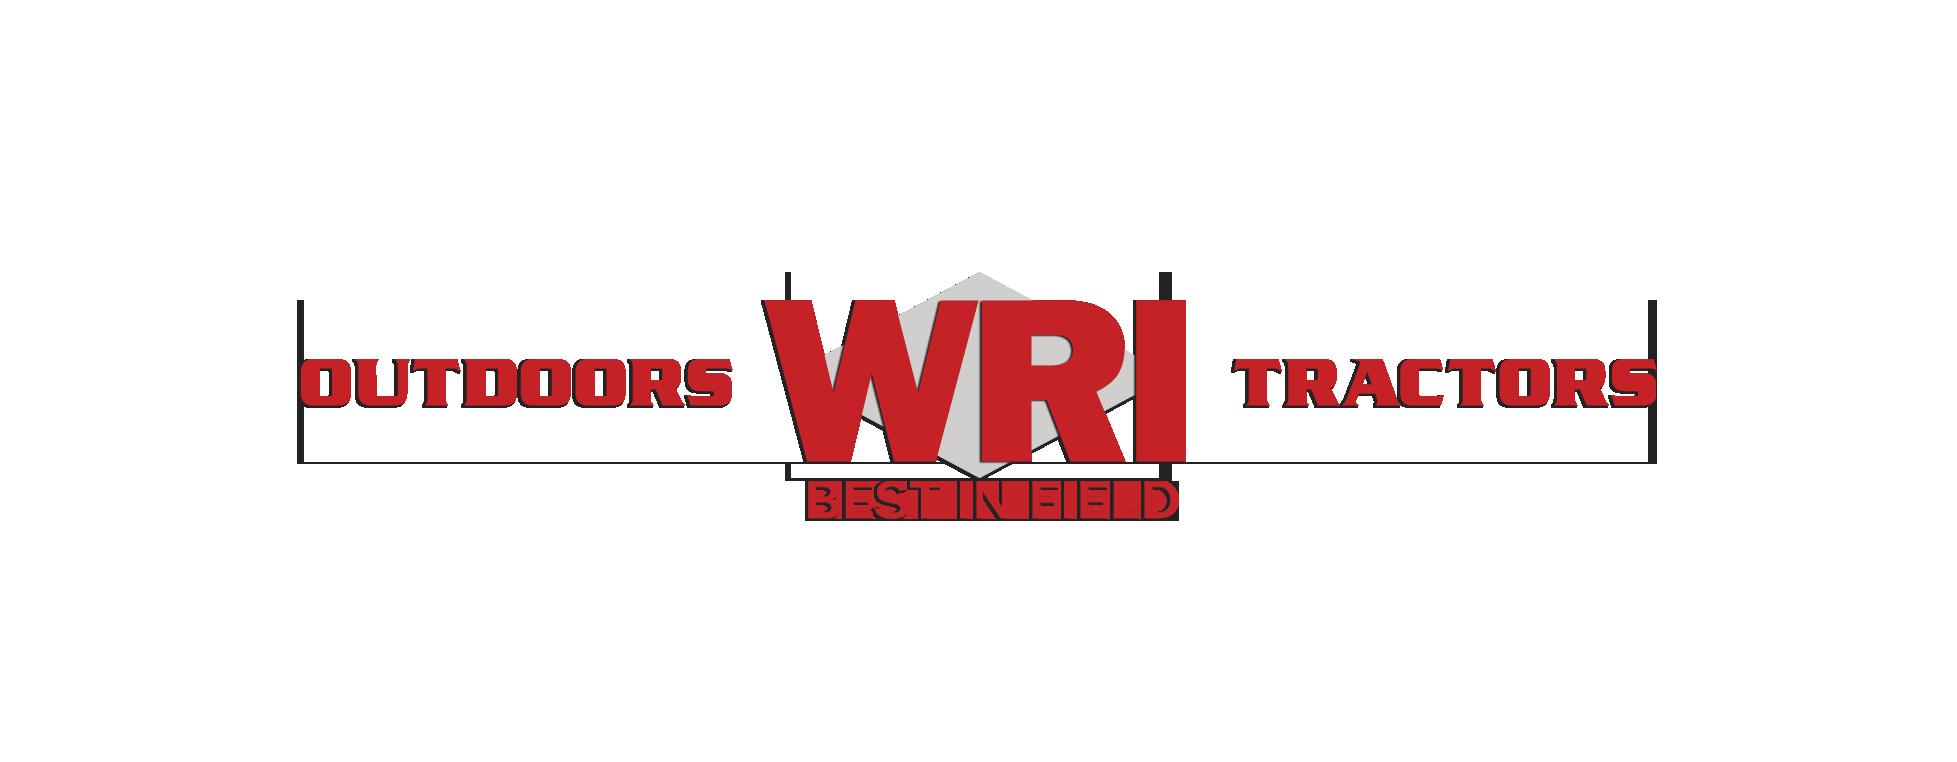 Woods® GBC48 Box Scraper | WRI Tractors